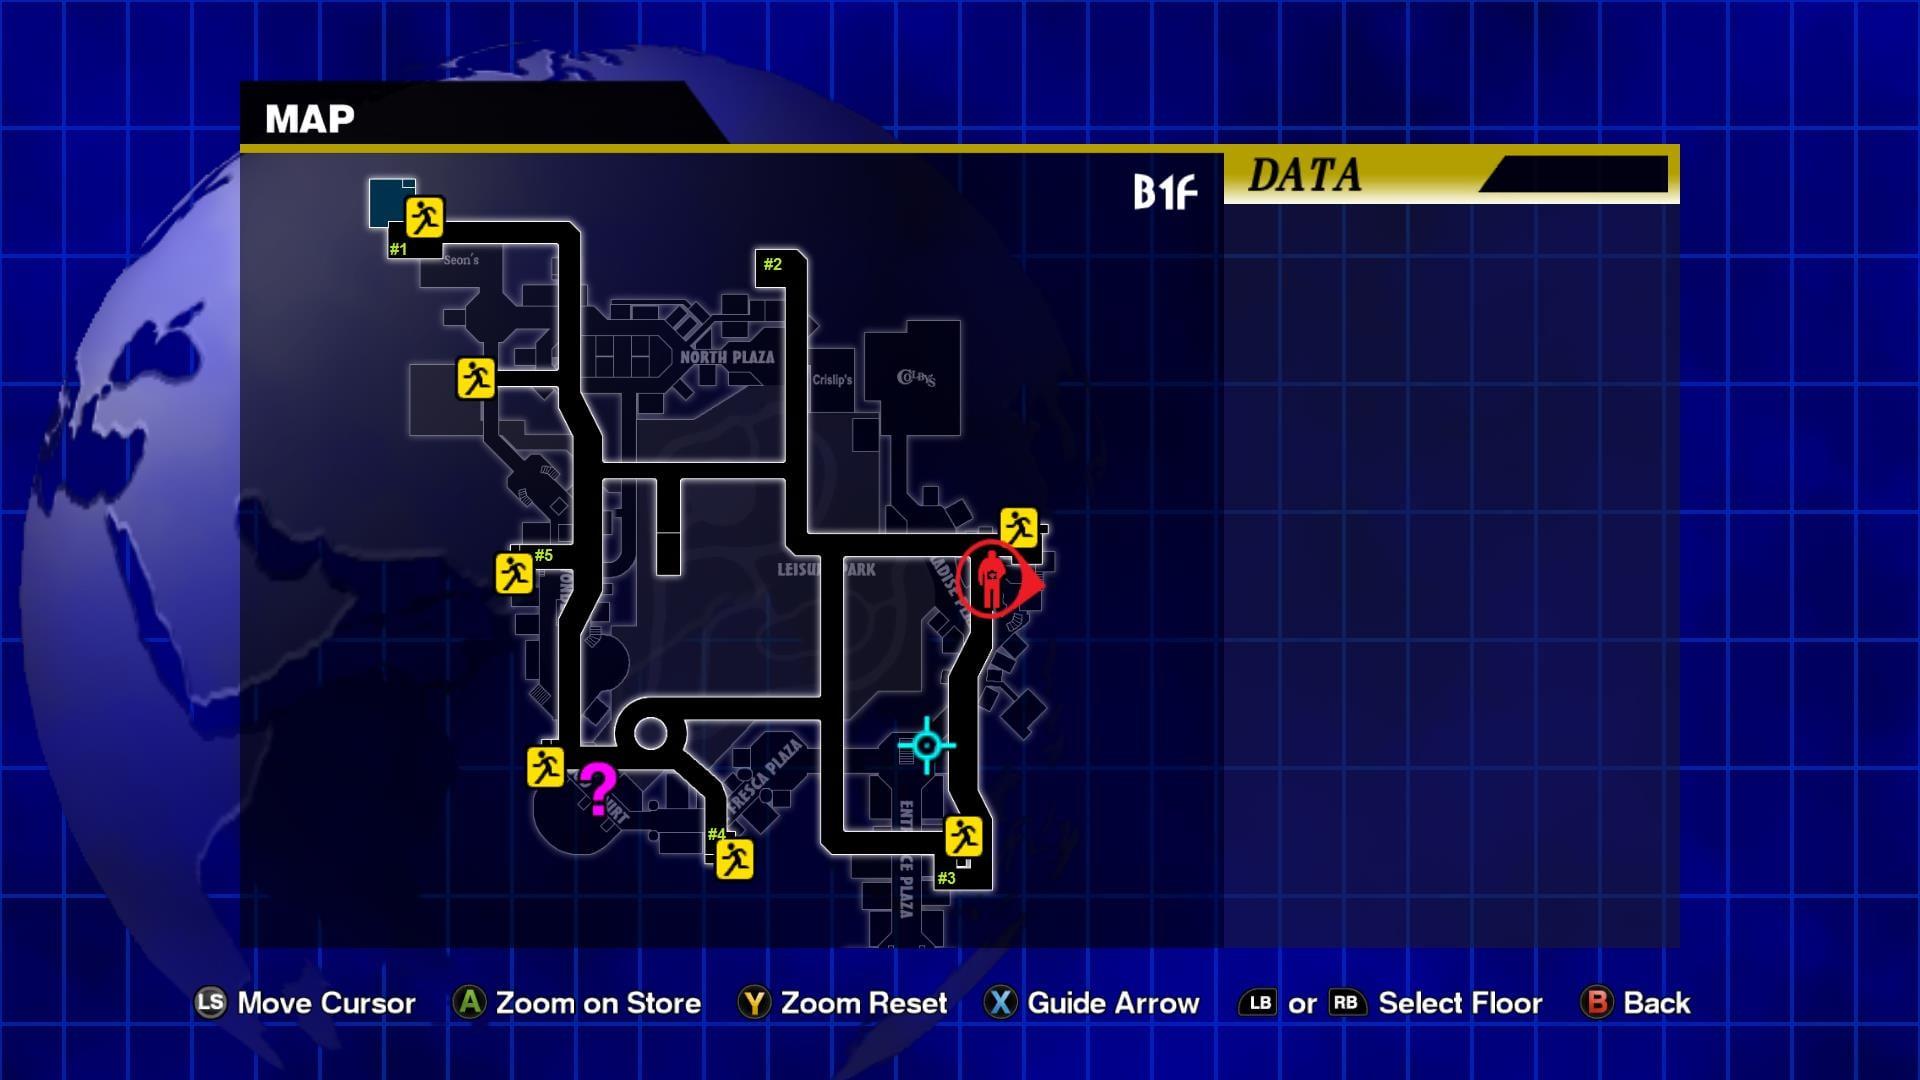 Bomb Truck/PP Sticker Locations